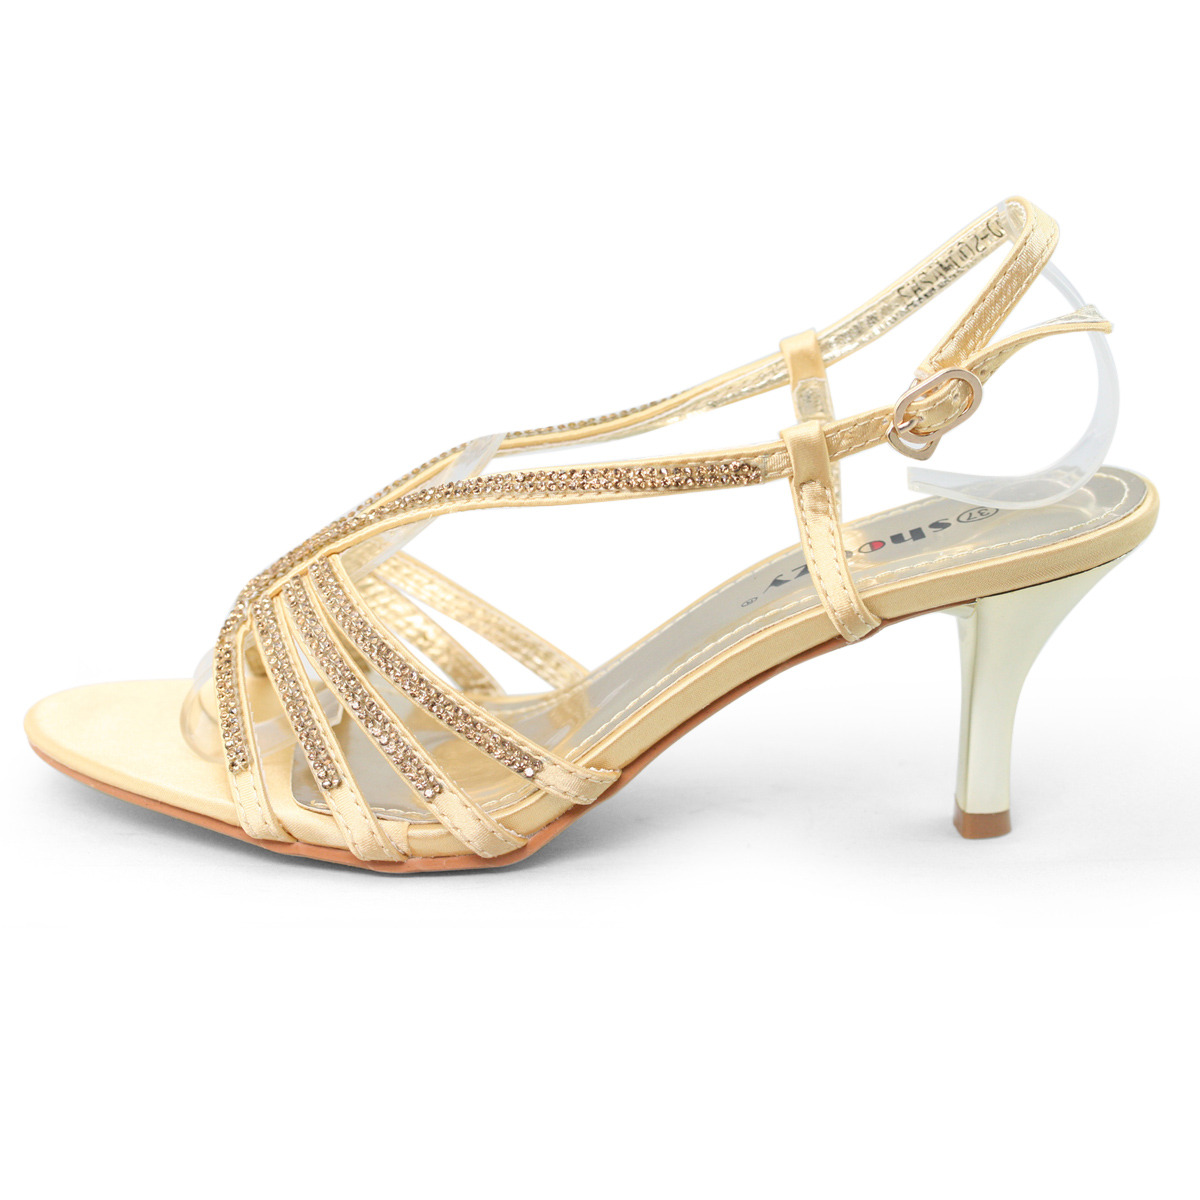 Womens rhinestone mid heel sandals silver gold wedding for Gold dress sandals for wedding